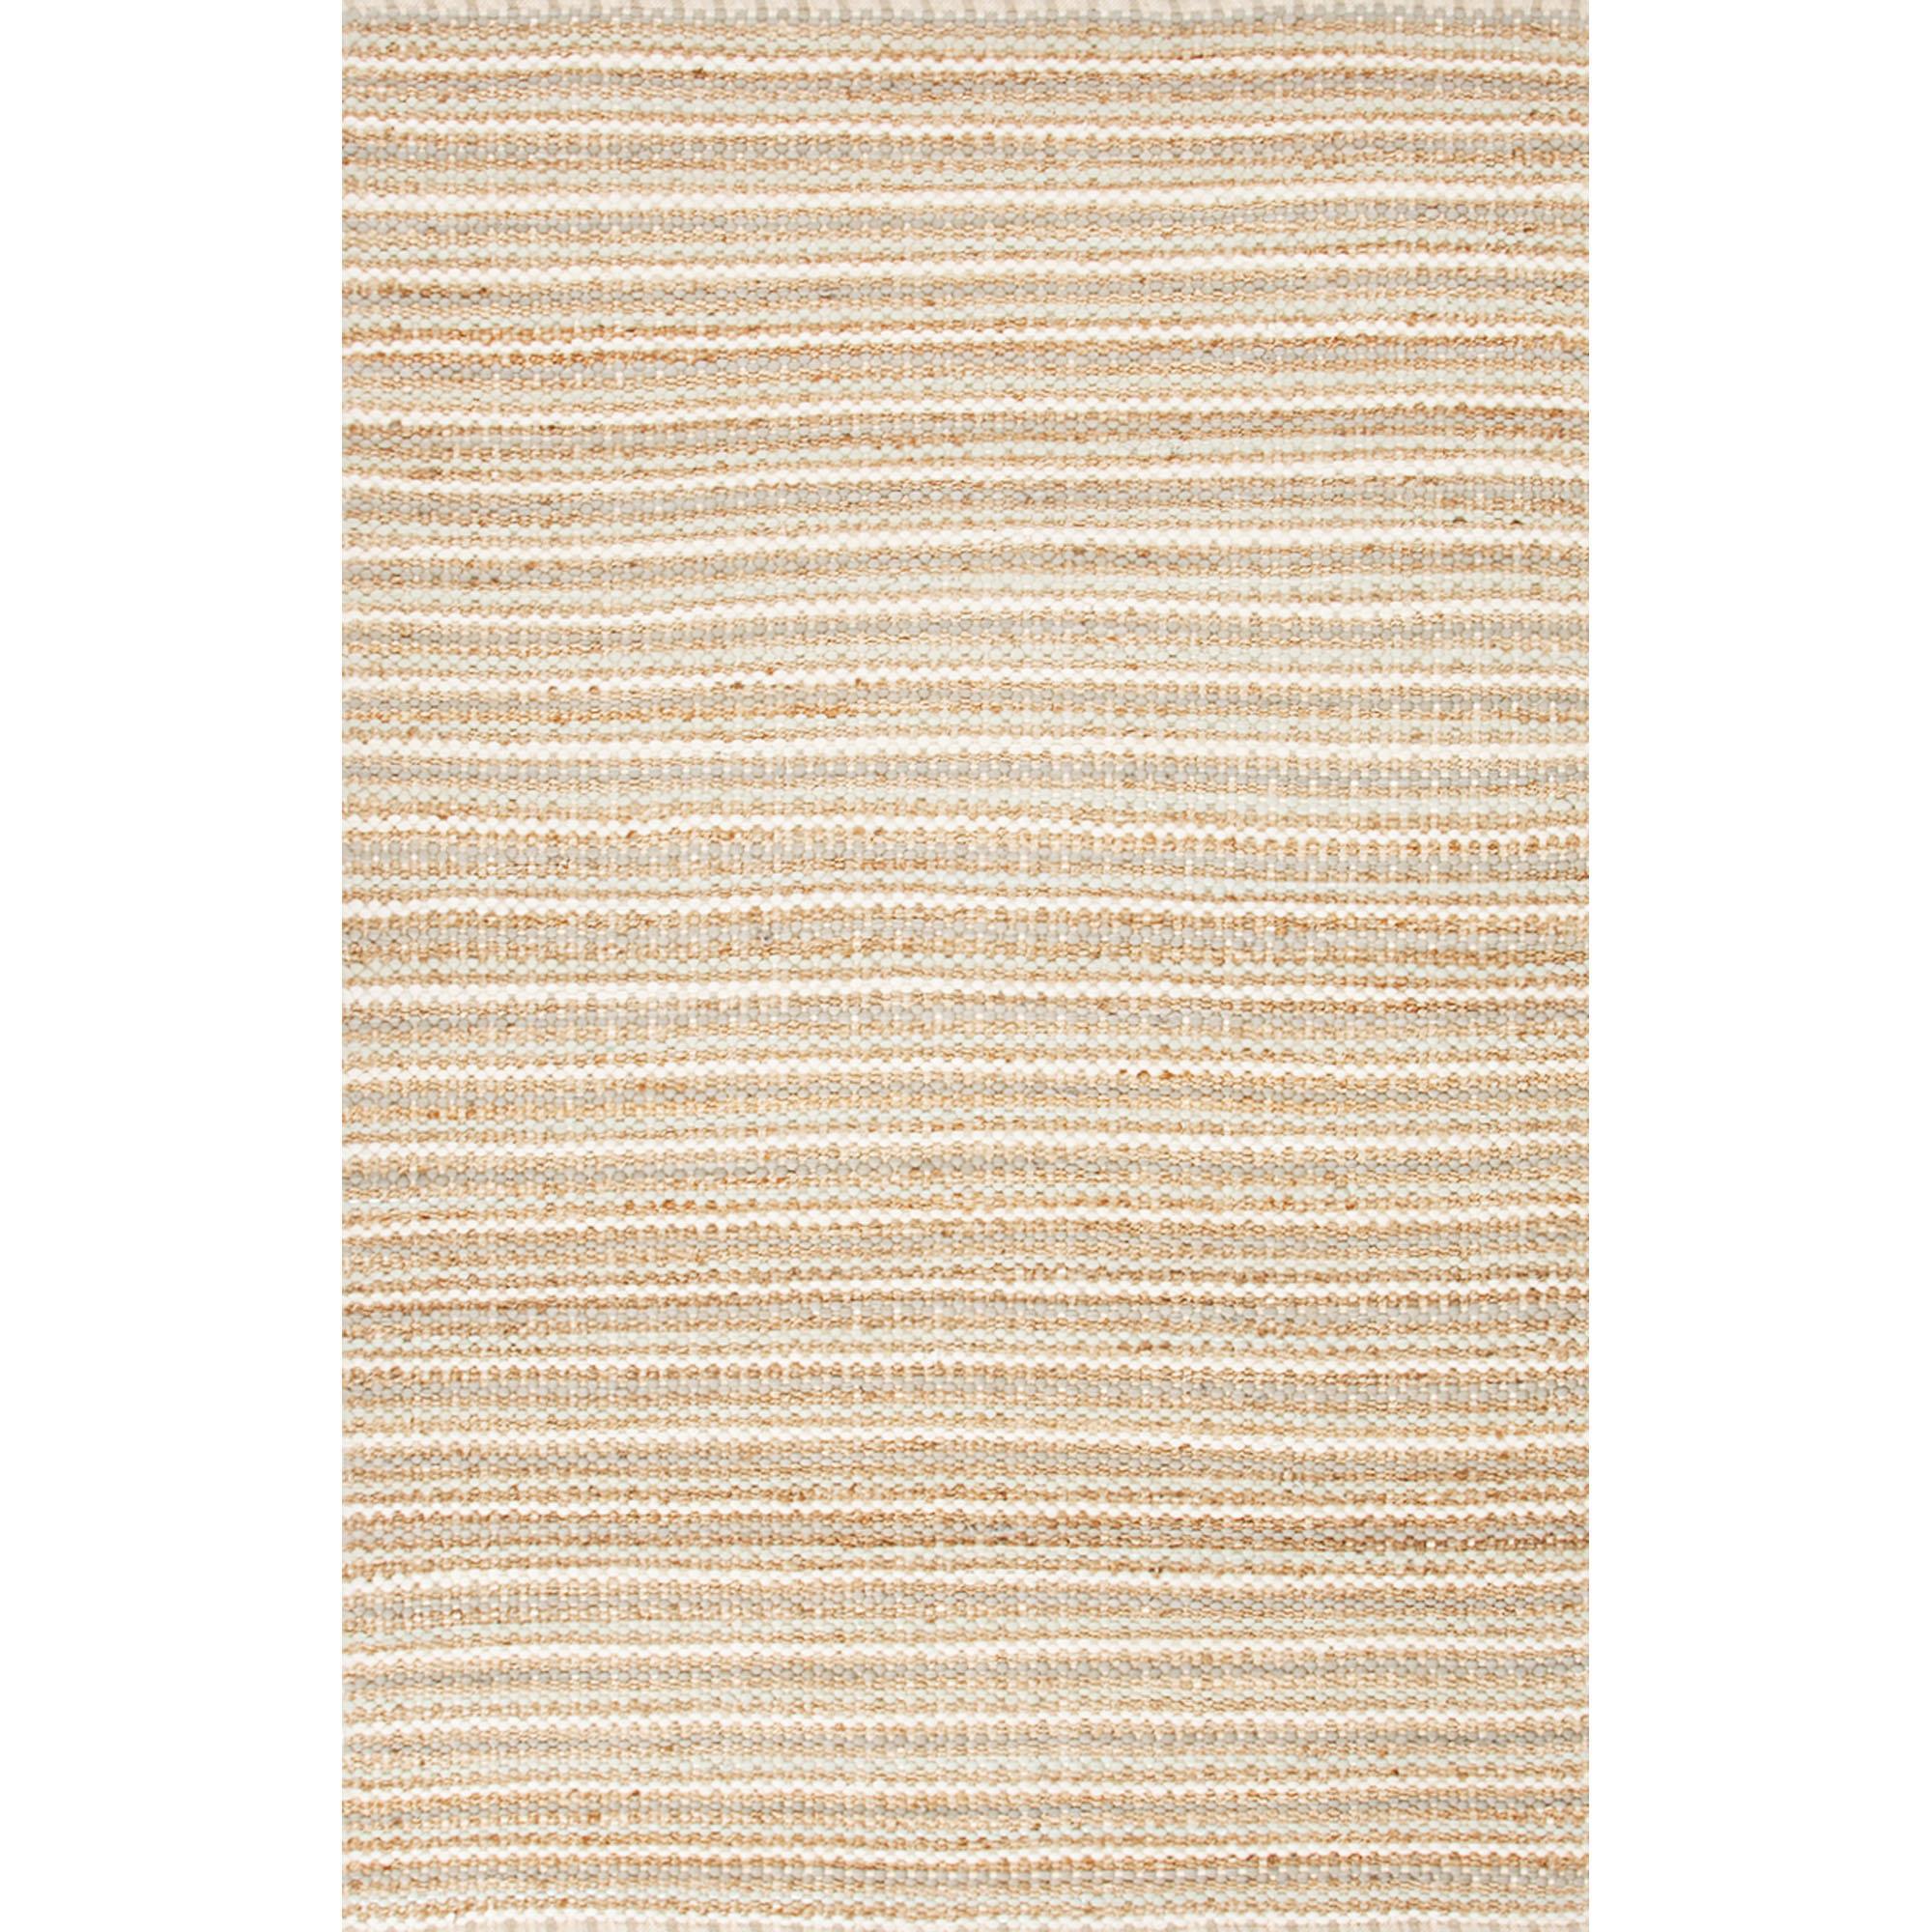 Andes 3.6 x 5.6 Rug by JAIPUR Rugs at Sprintz Furniture